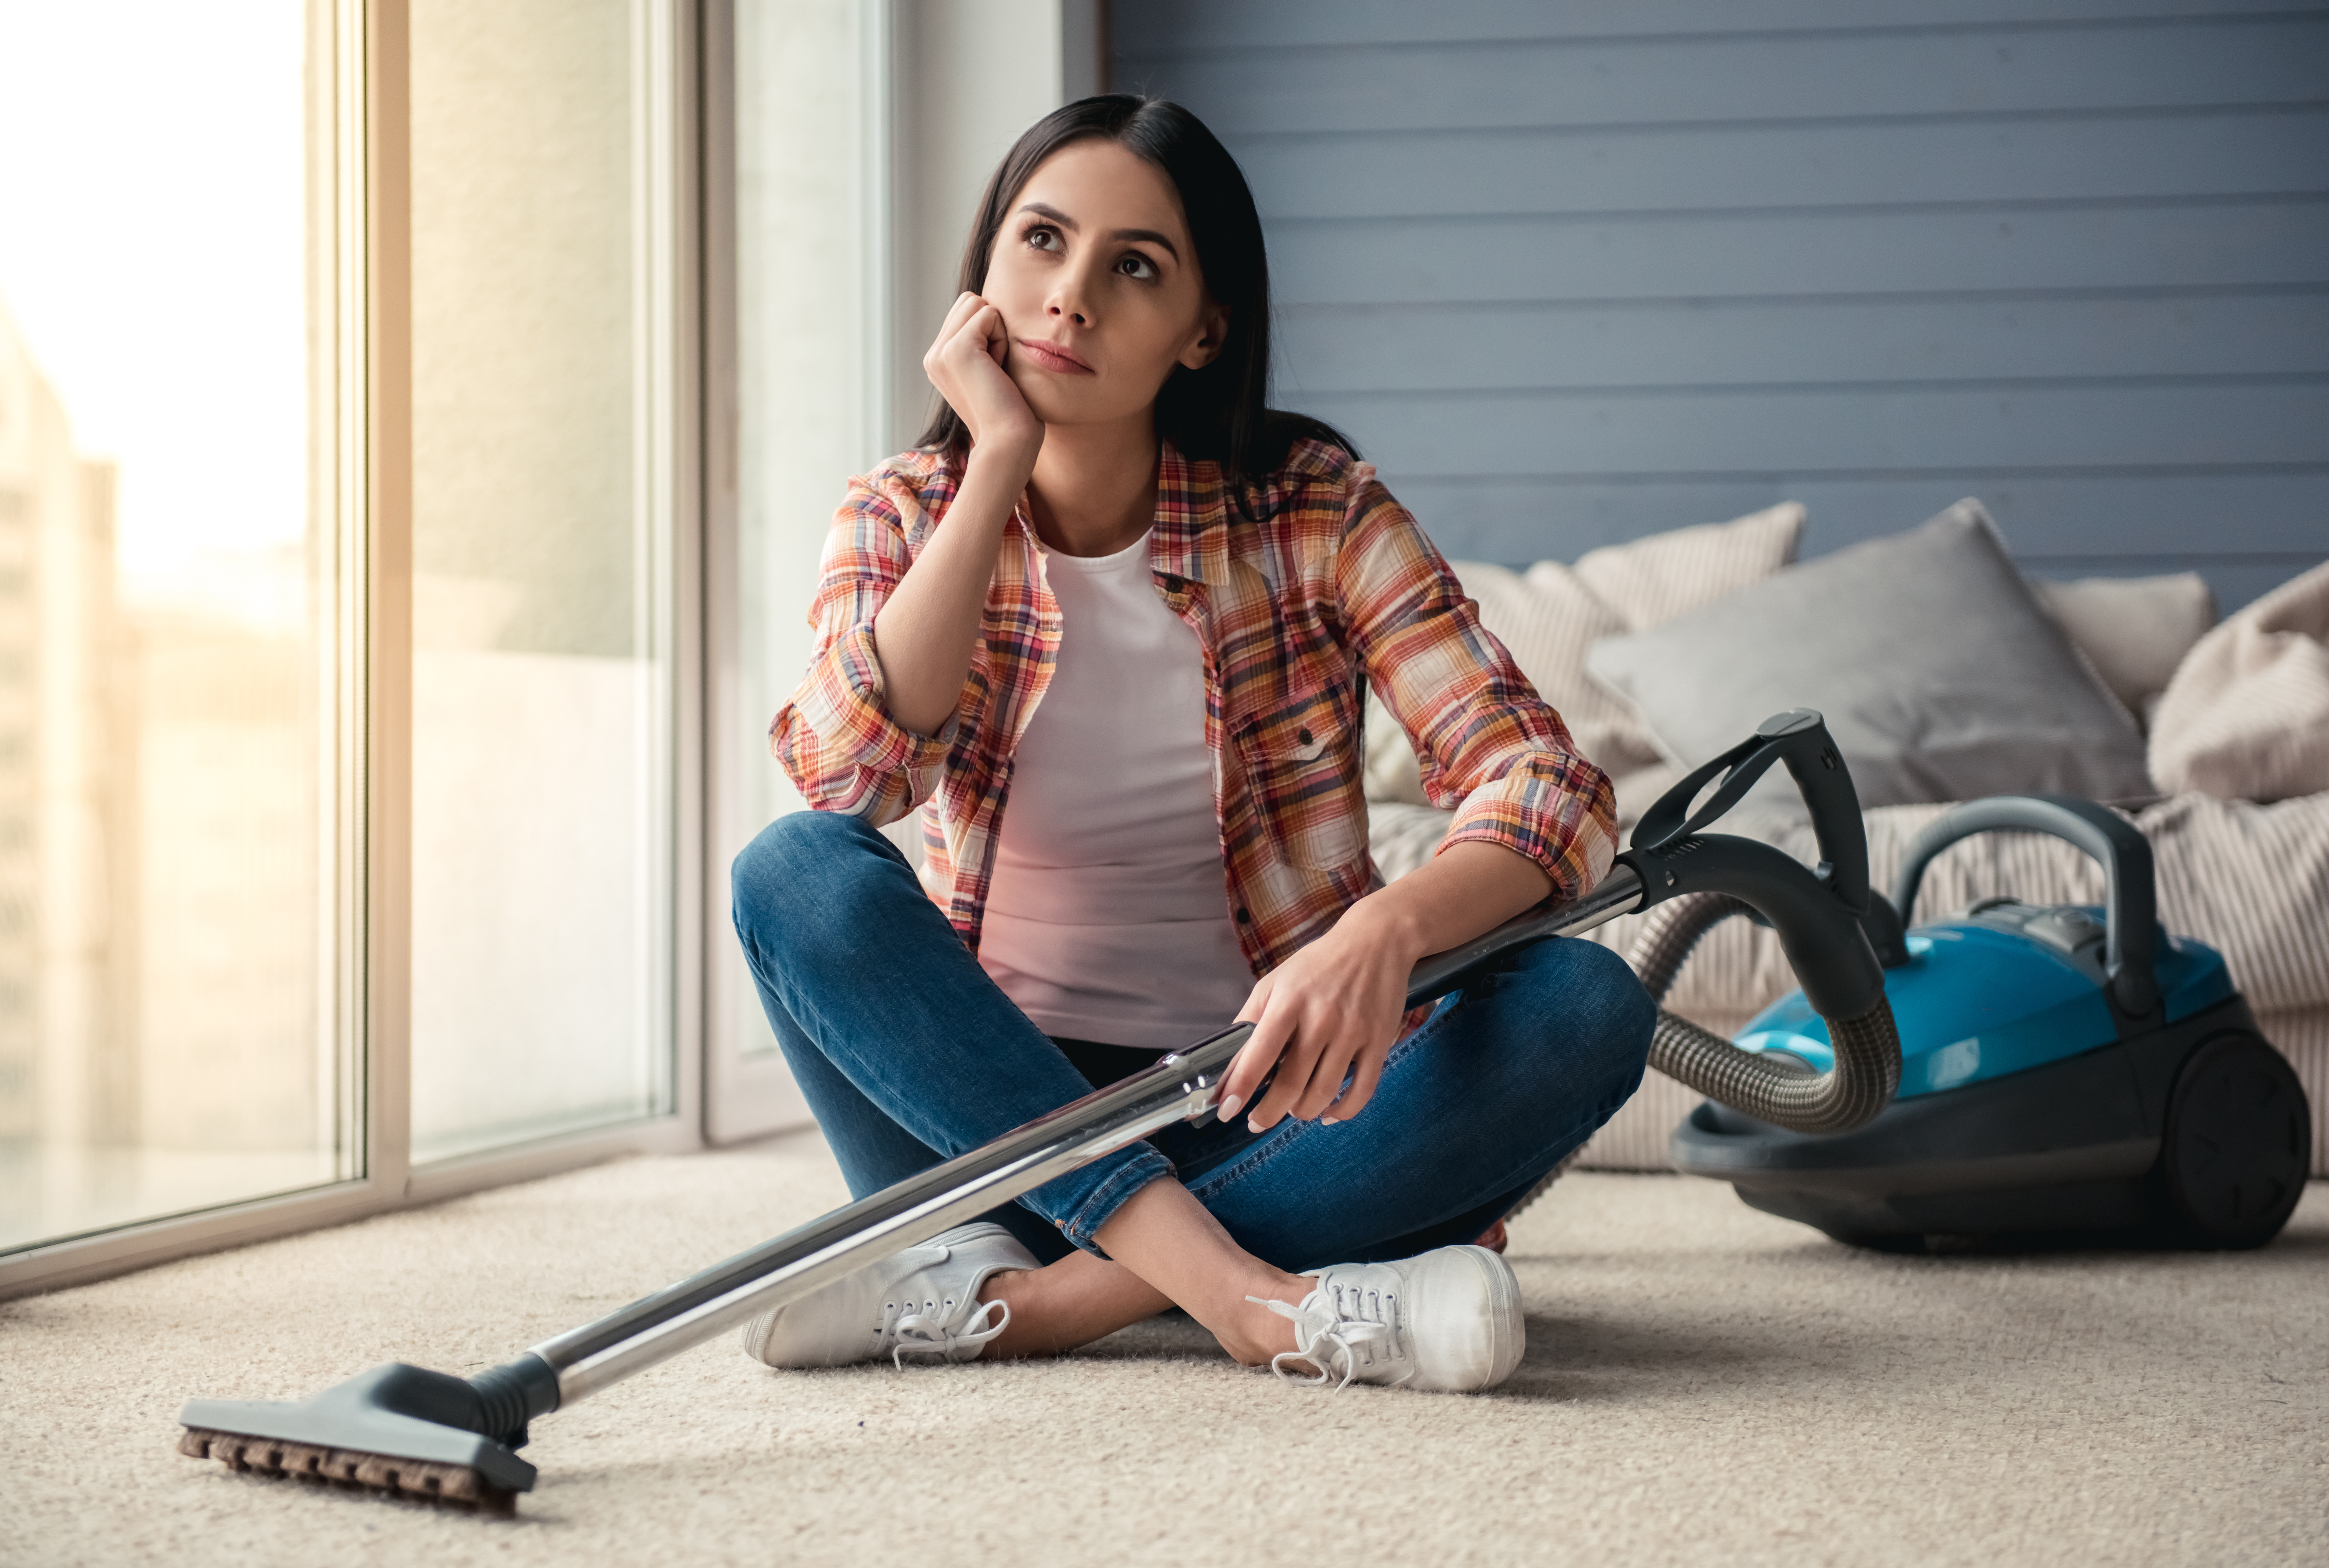 kobieta sprząta